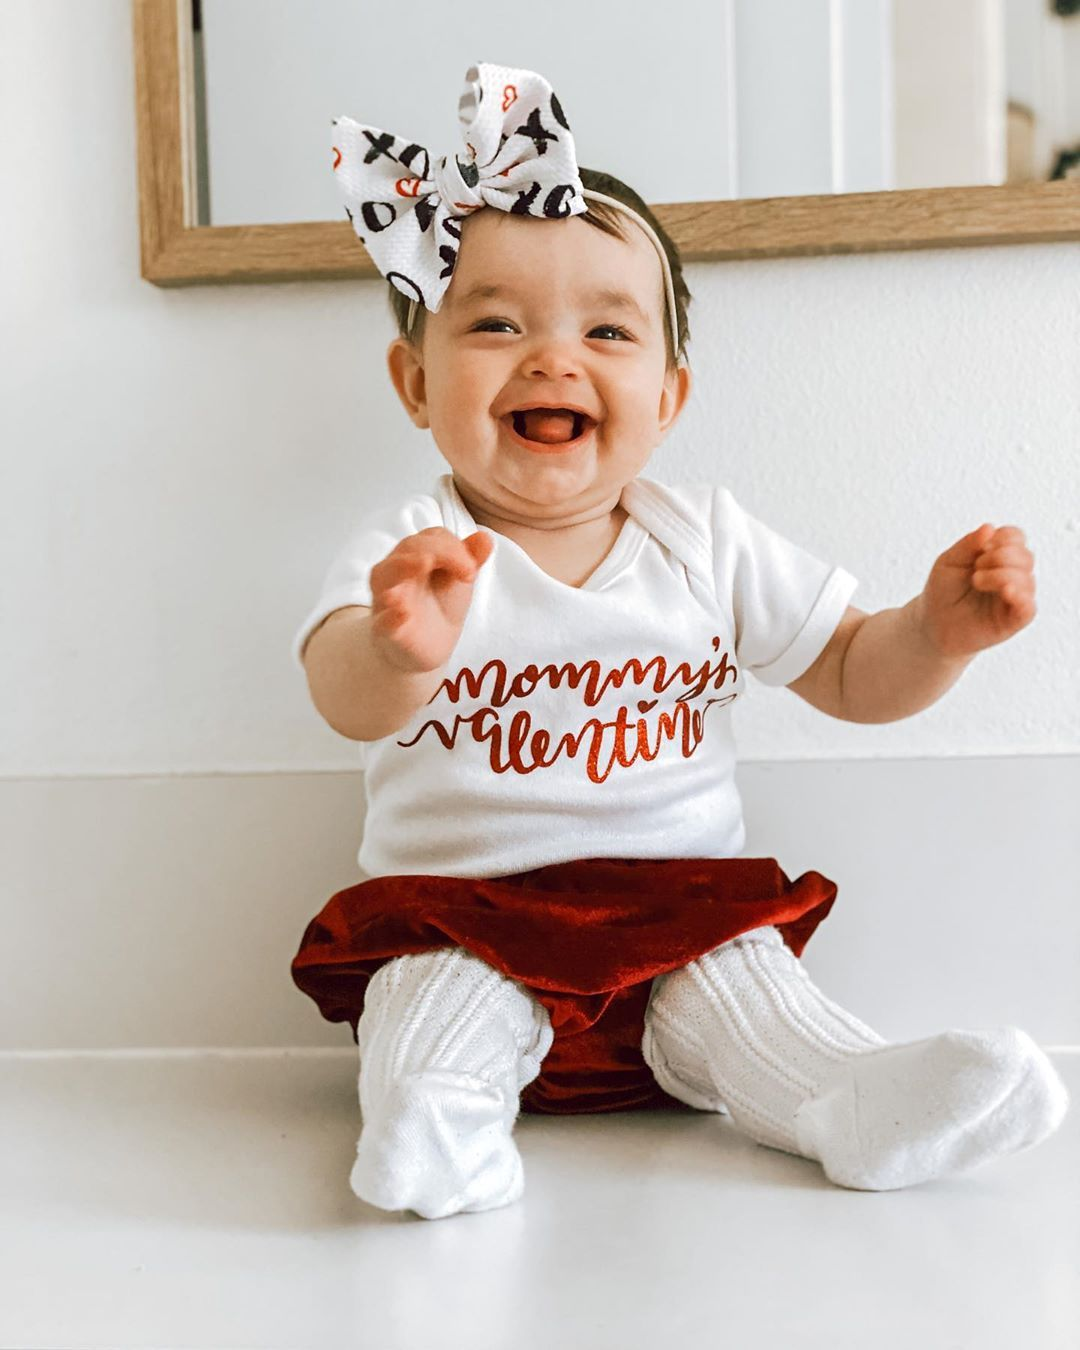 "Angelina Marie🌿 on Instagram: ""Mommy's Valentine!❤️ • • • #valentines #baby #littlebit #babygirl #esthergracemiracle #like #likelikelike #bows #mama #mommysgirl"""